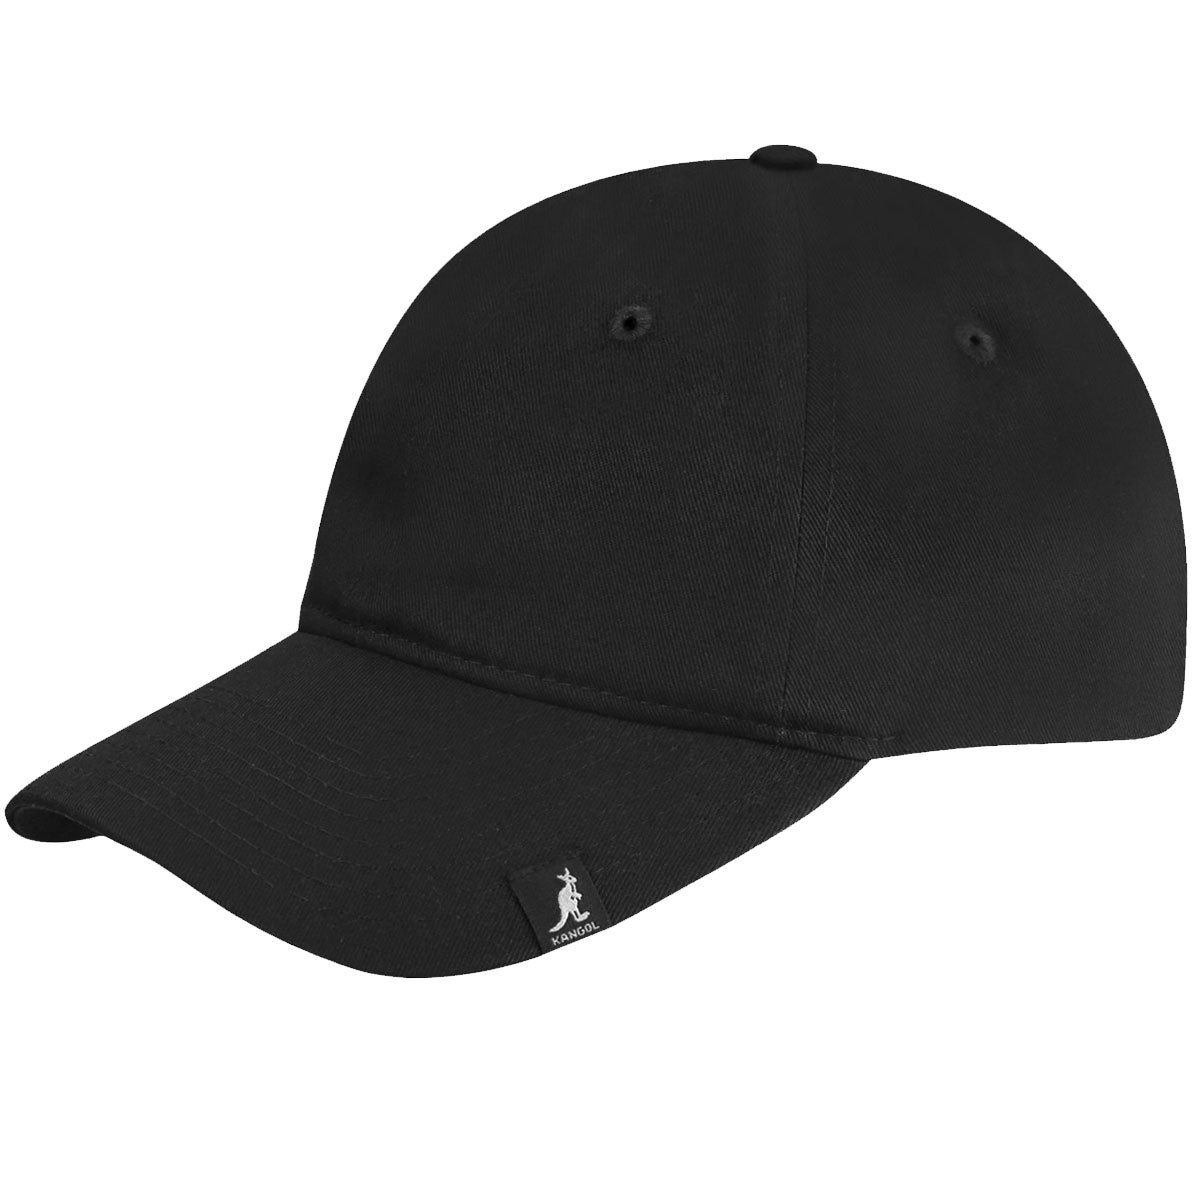 Cotton Adjustable Baseball - Black/1SFM